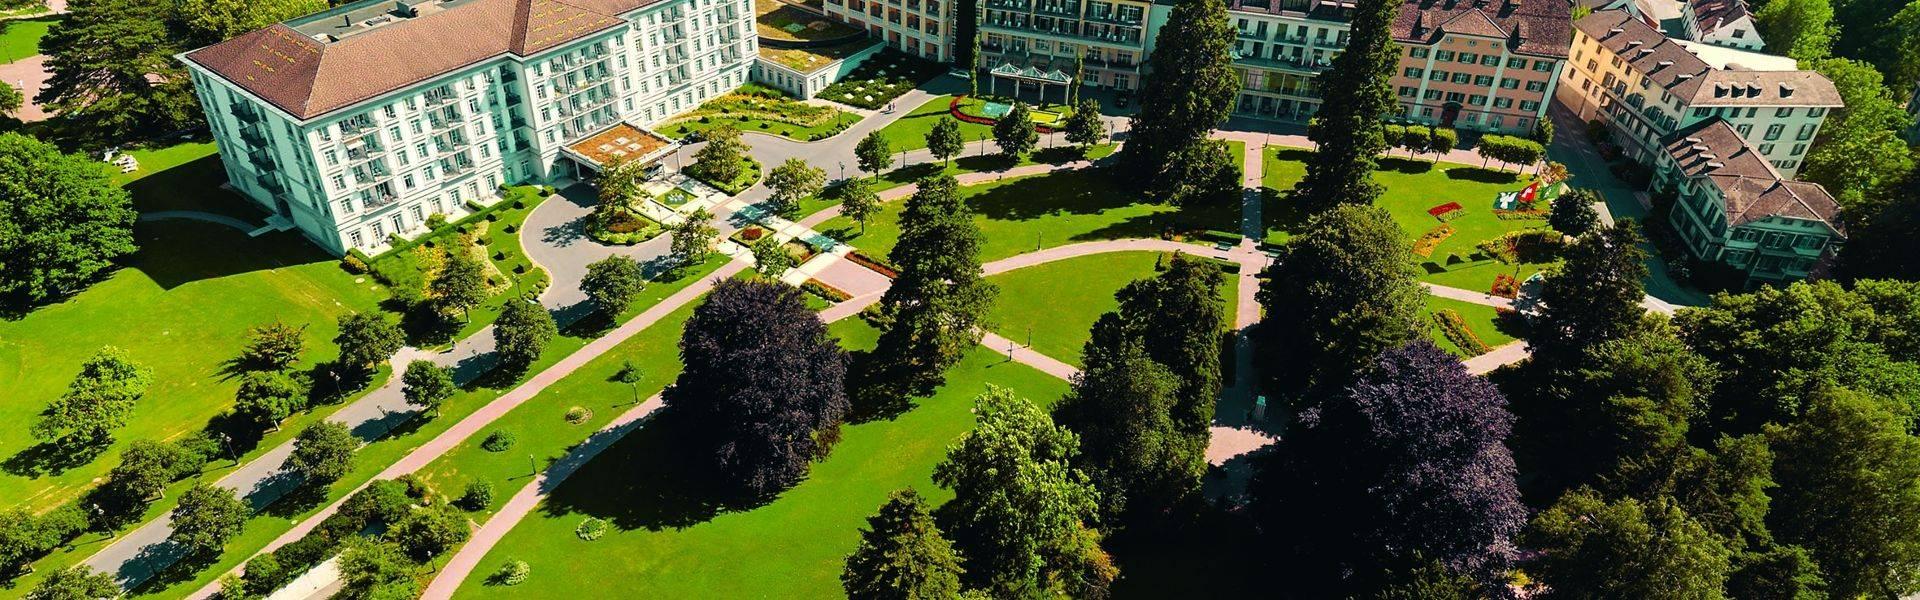 Grand Resort Bad Ragaz Property Shot Aerial